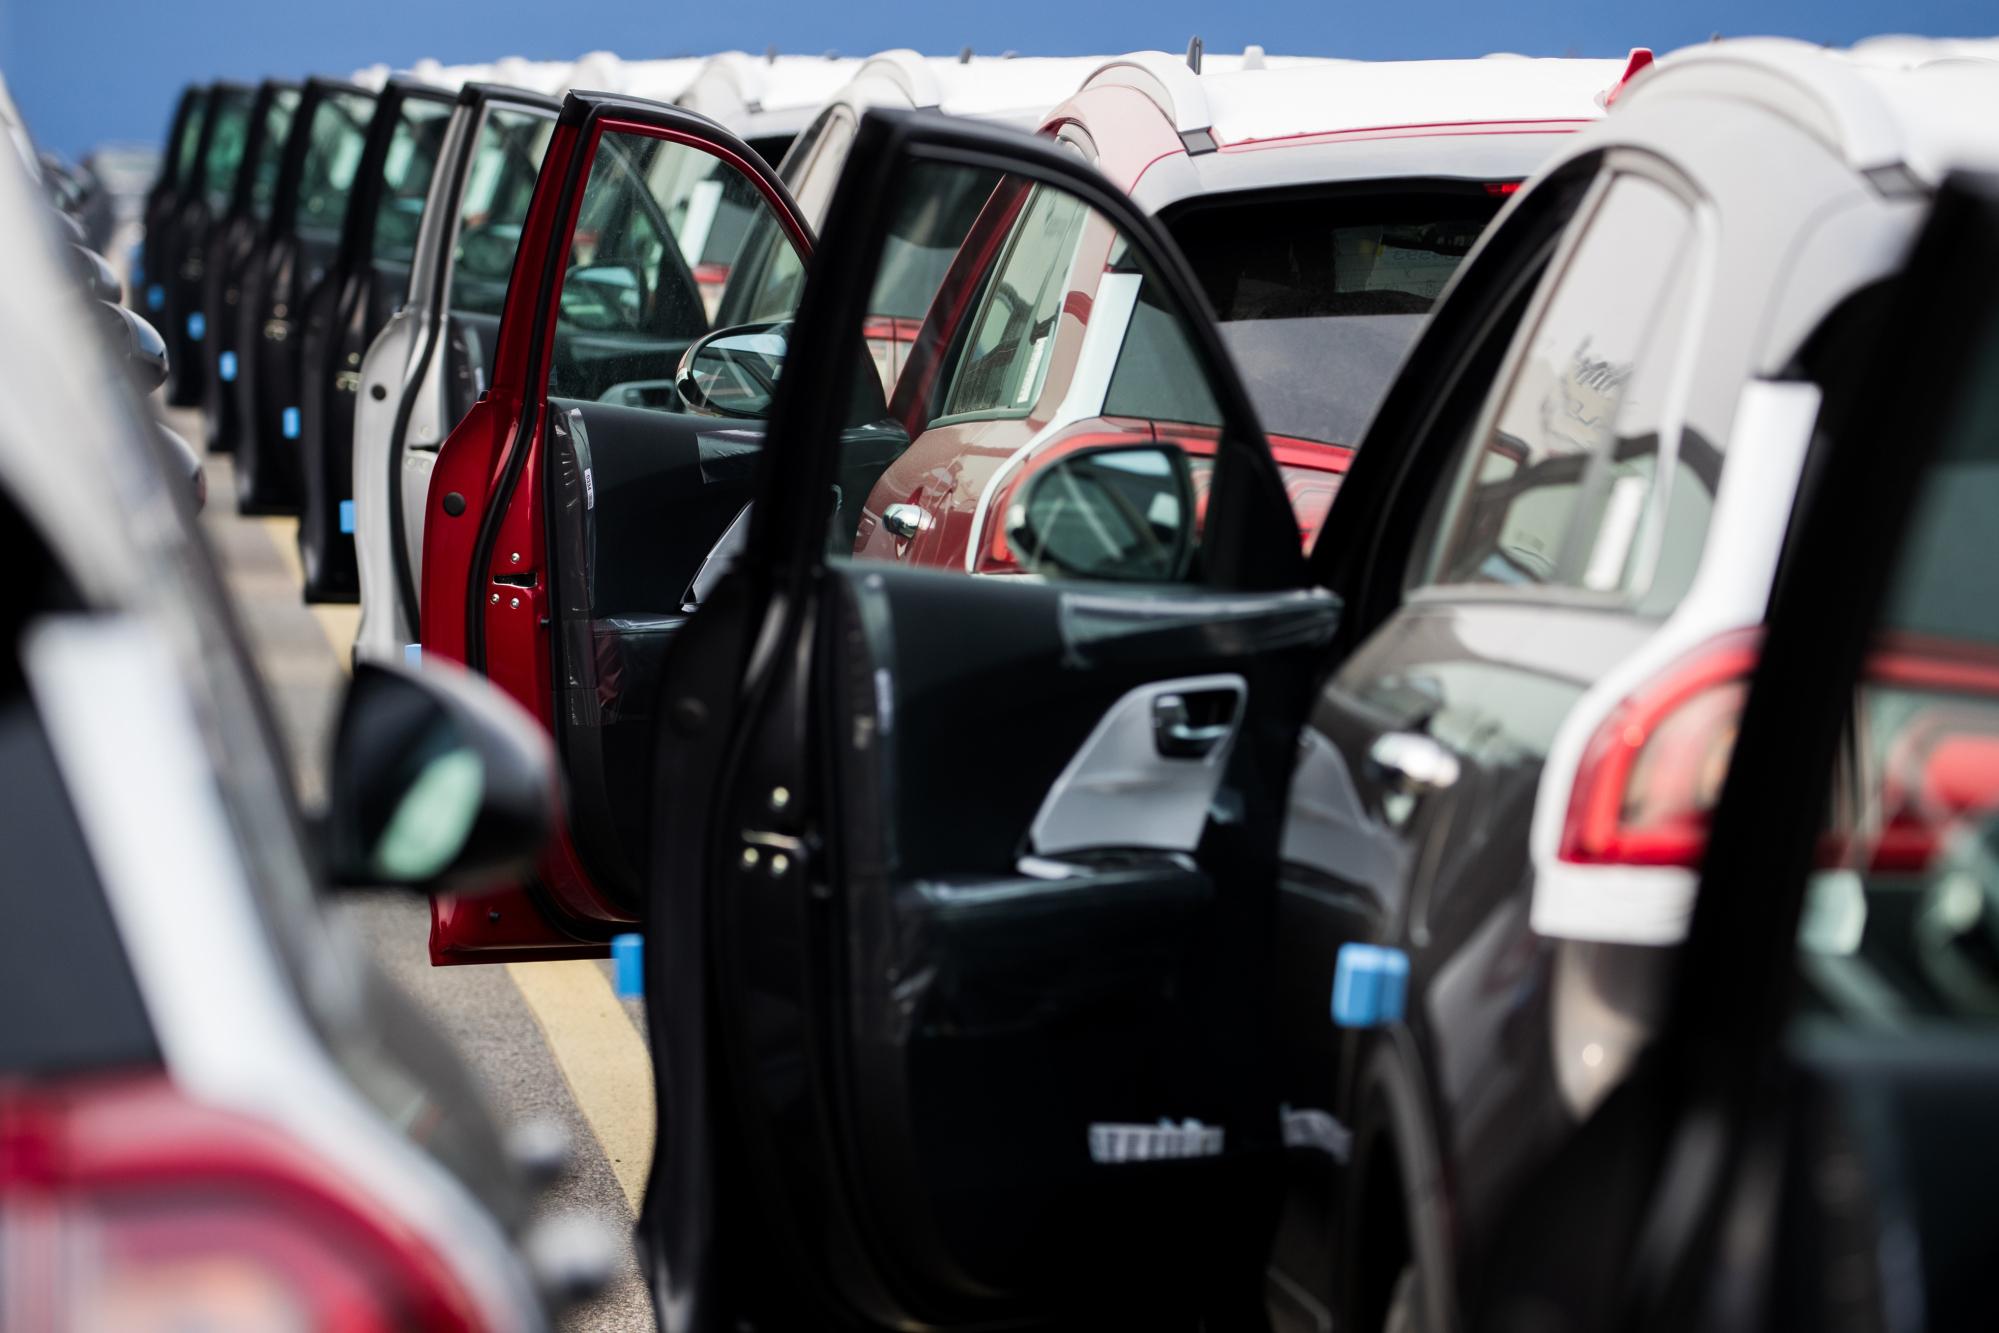 EU Eyes Quick U.S. Trade Pact to Avoid Trump Car-Duty Threat